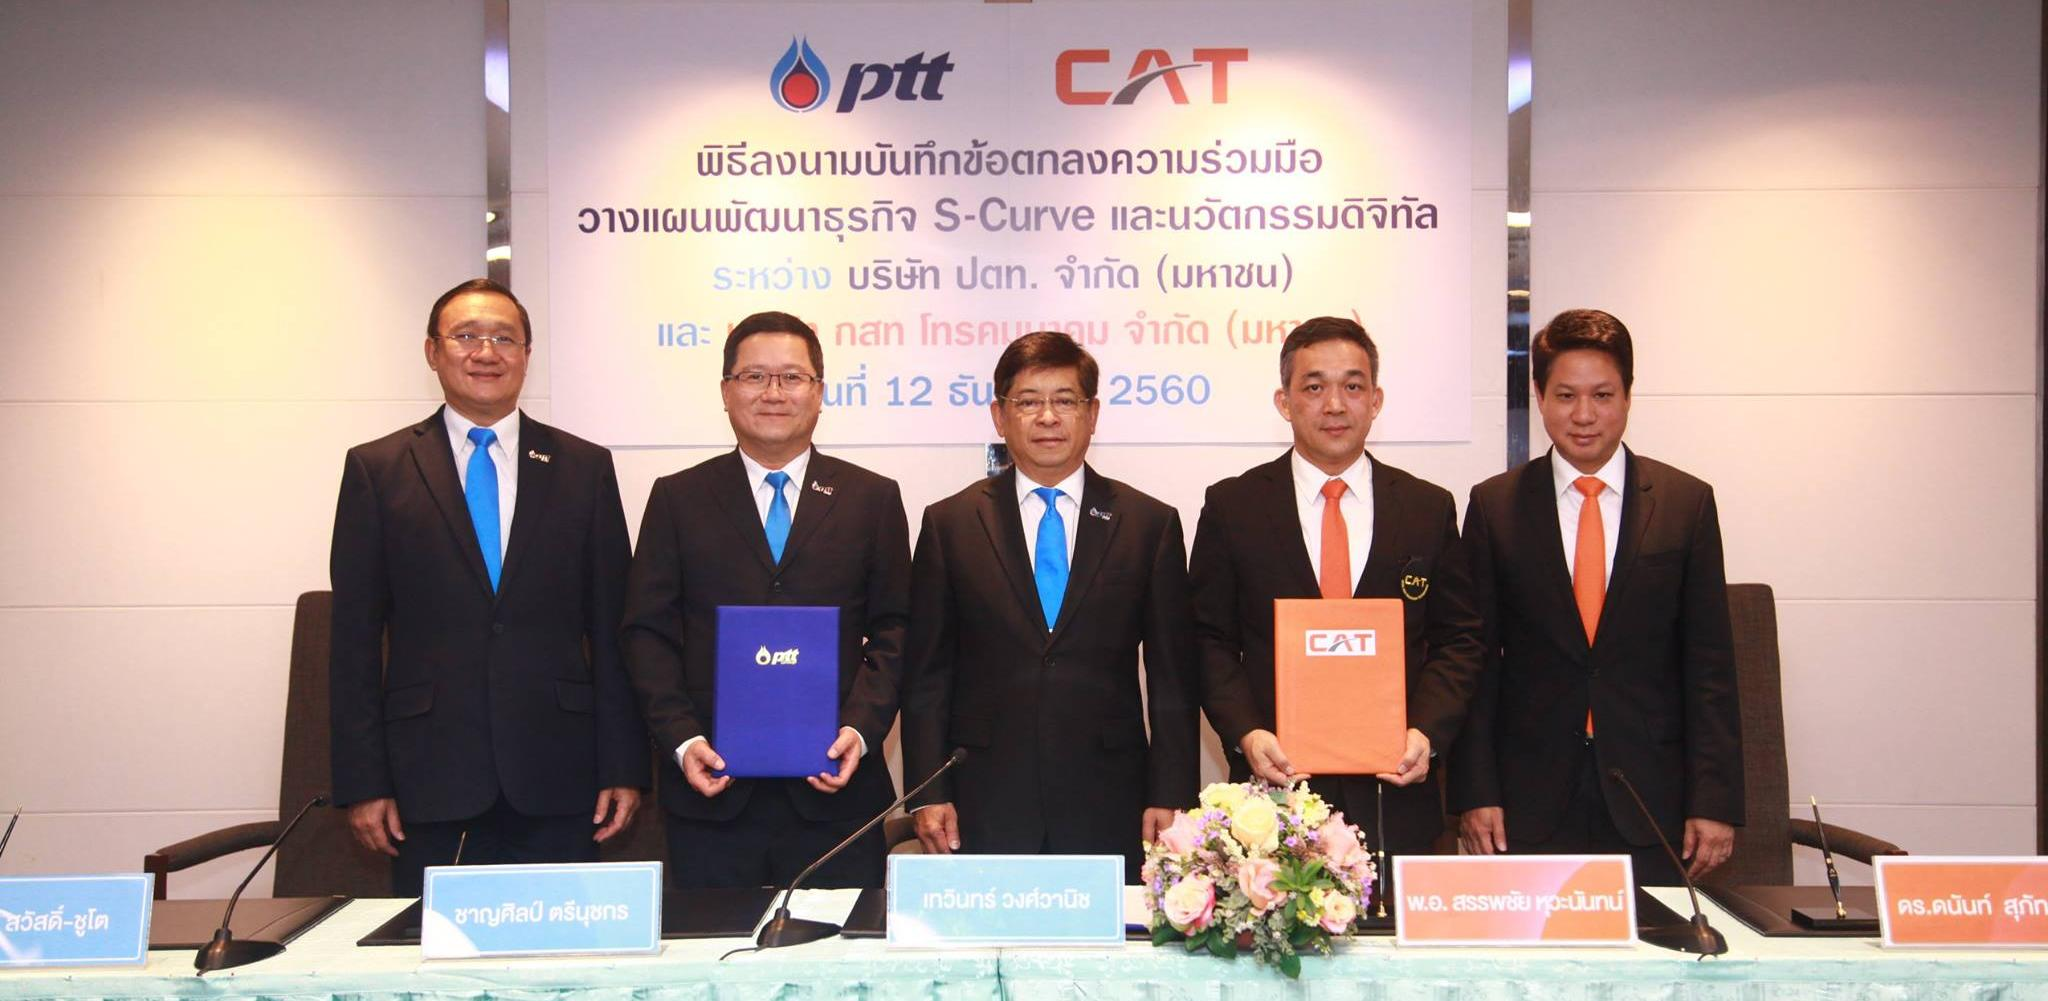 CAT จับมือ PTT  ลงนามความร่วมมือพัฒนาธุรกิจ S-Curve และนวัตกรรมดิจิทัล